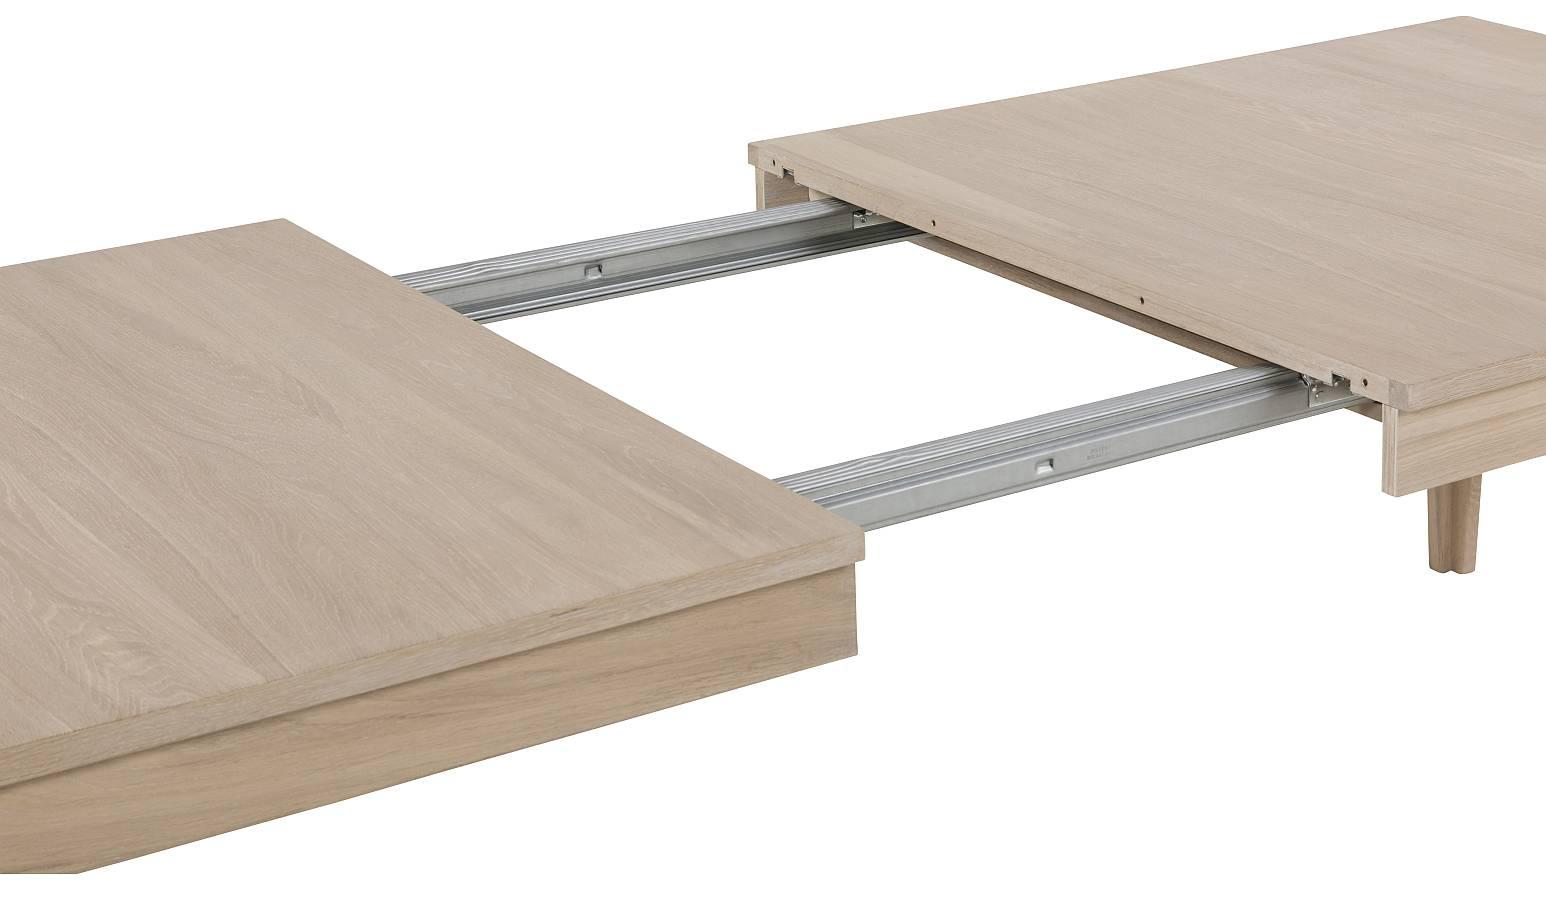 24Designs Nicky Verlengbare Tafel L220-320 Cm Inclusief 2 Inlegbladen